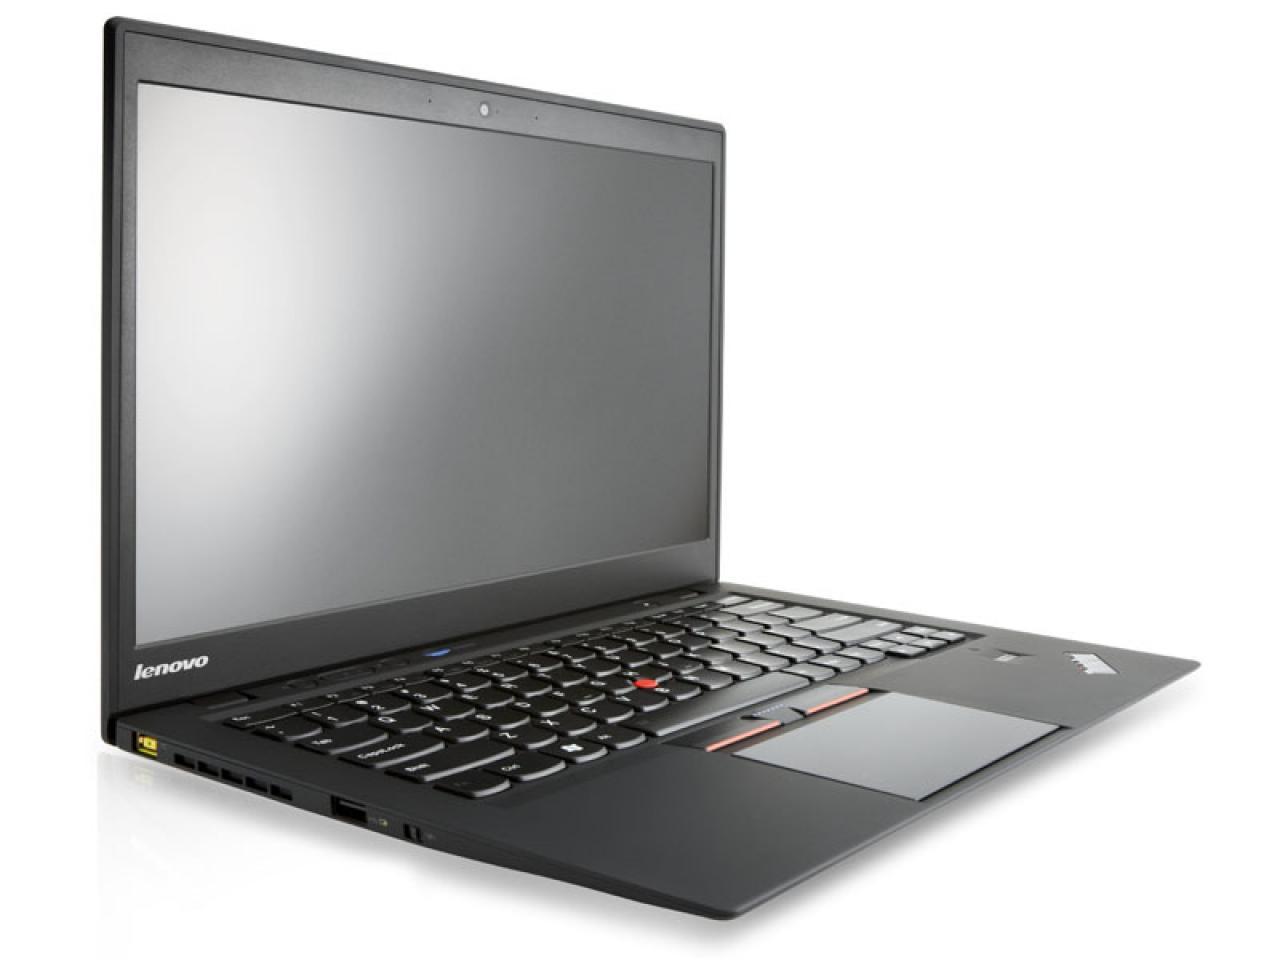 Lenovo ThinkPad X1 Carbon 3. Gen  - shop.bb-net.de